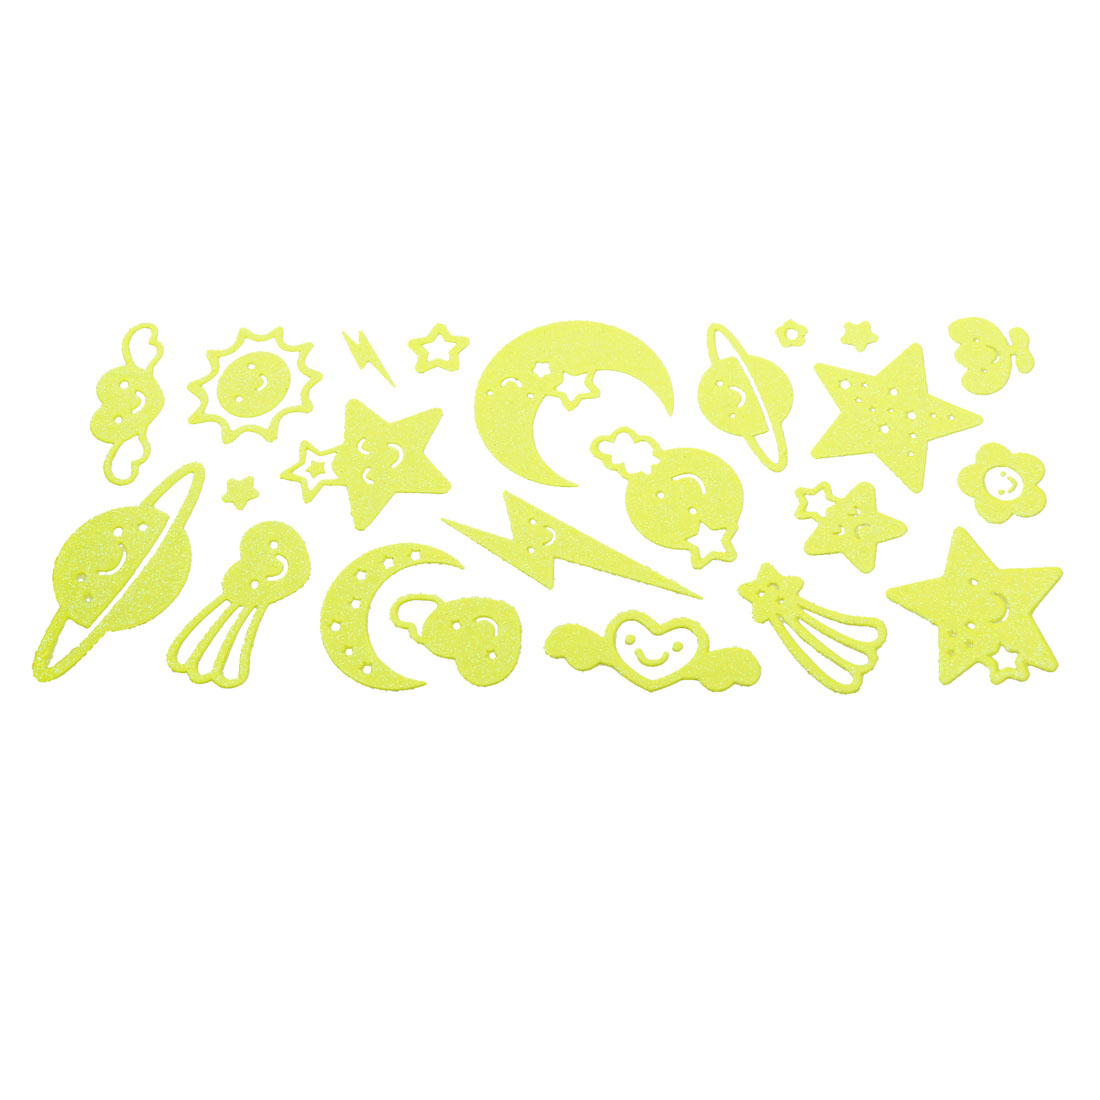 Glass Decoration Star Moon Flower Design Luminous Stickers 23 in 1 Set